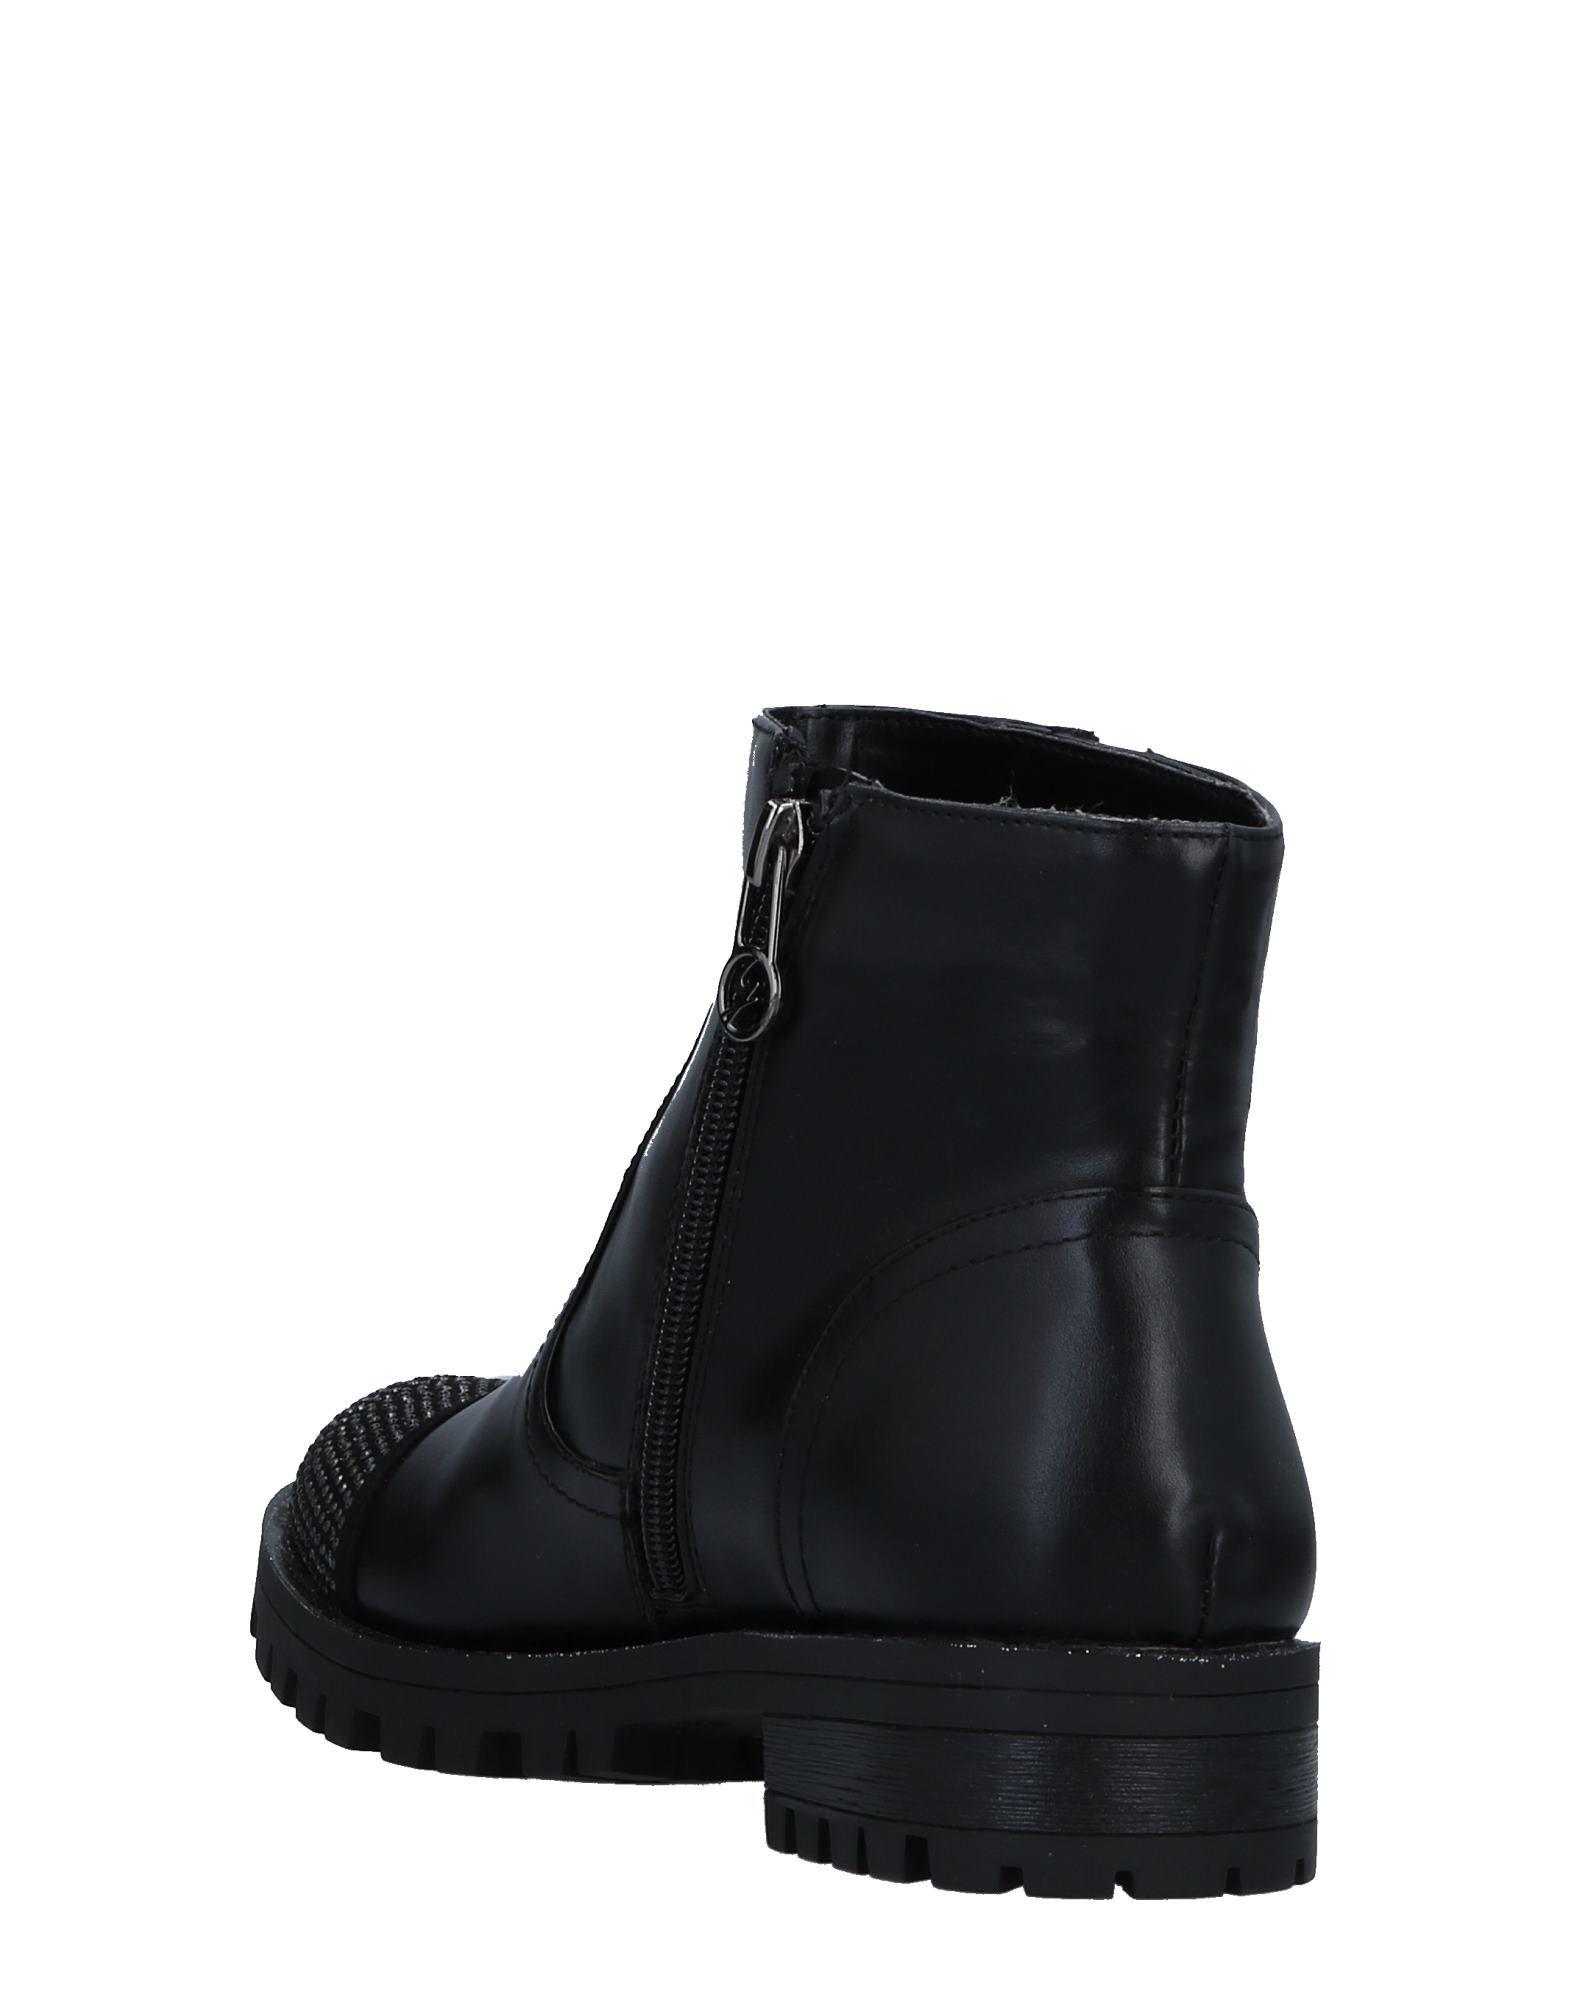 Gattinoni Gute Stiefelette Damen  11517336CP Gute Gattinoni Qualität beliebte Schuhe ae63b1